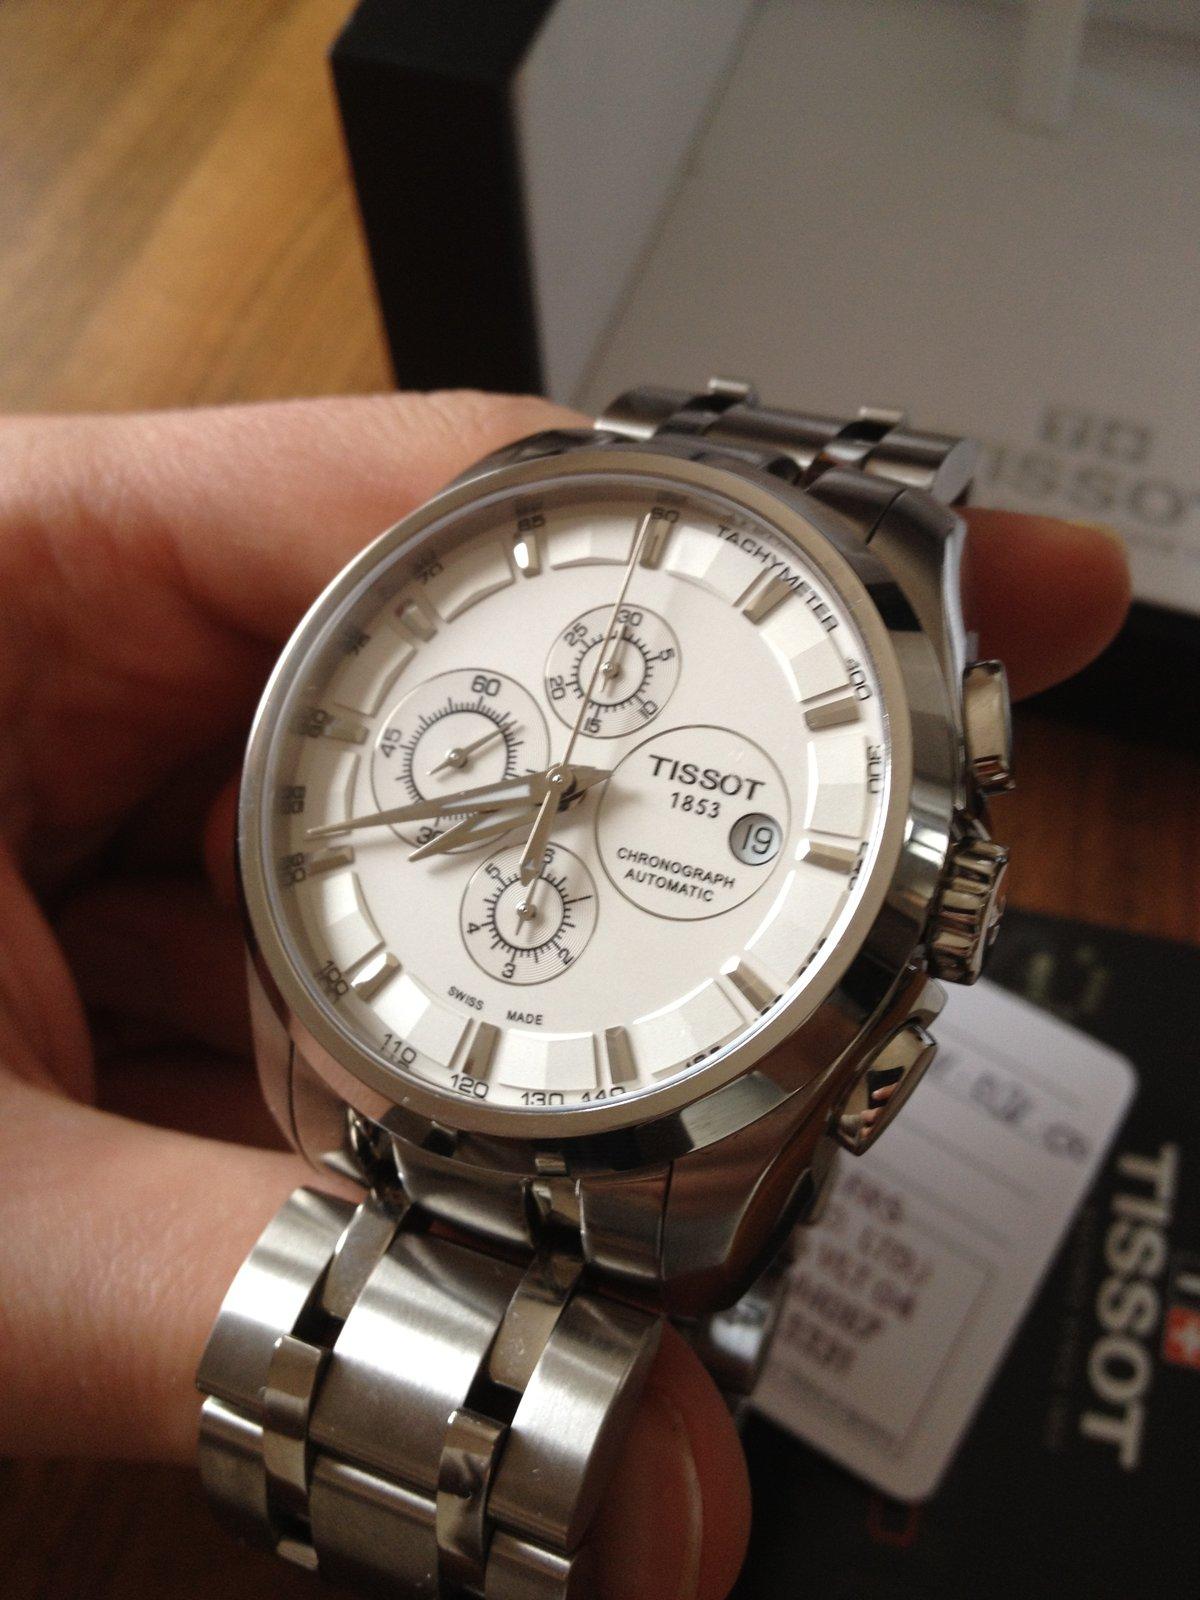 [Reserviert] Tissot Couturier Automatic Chronograph weiß